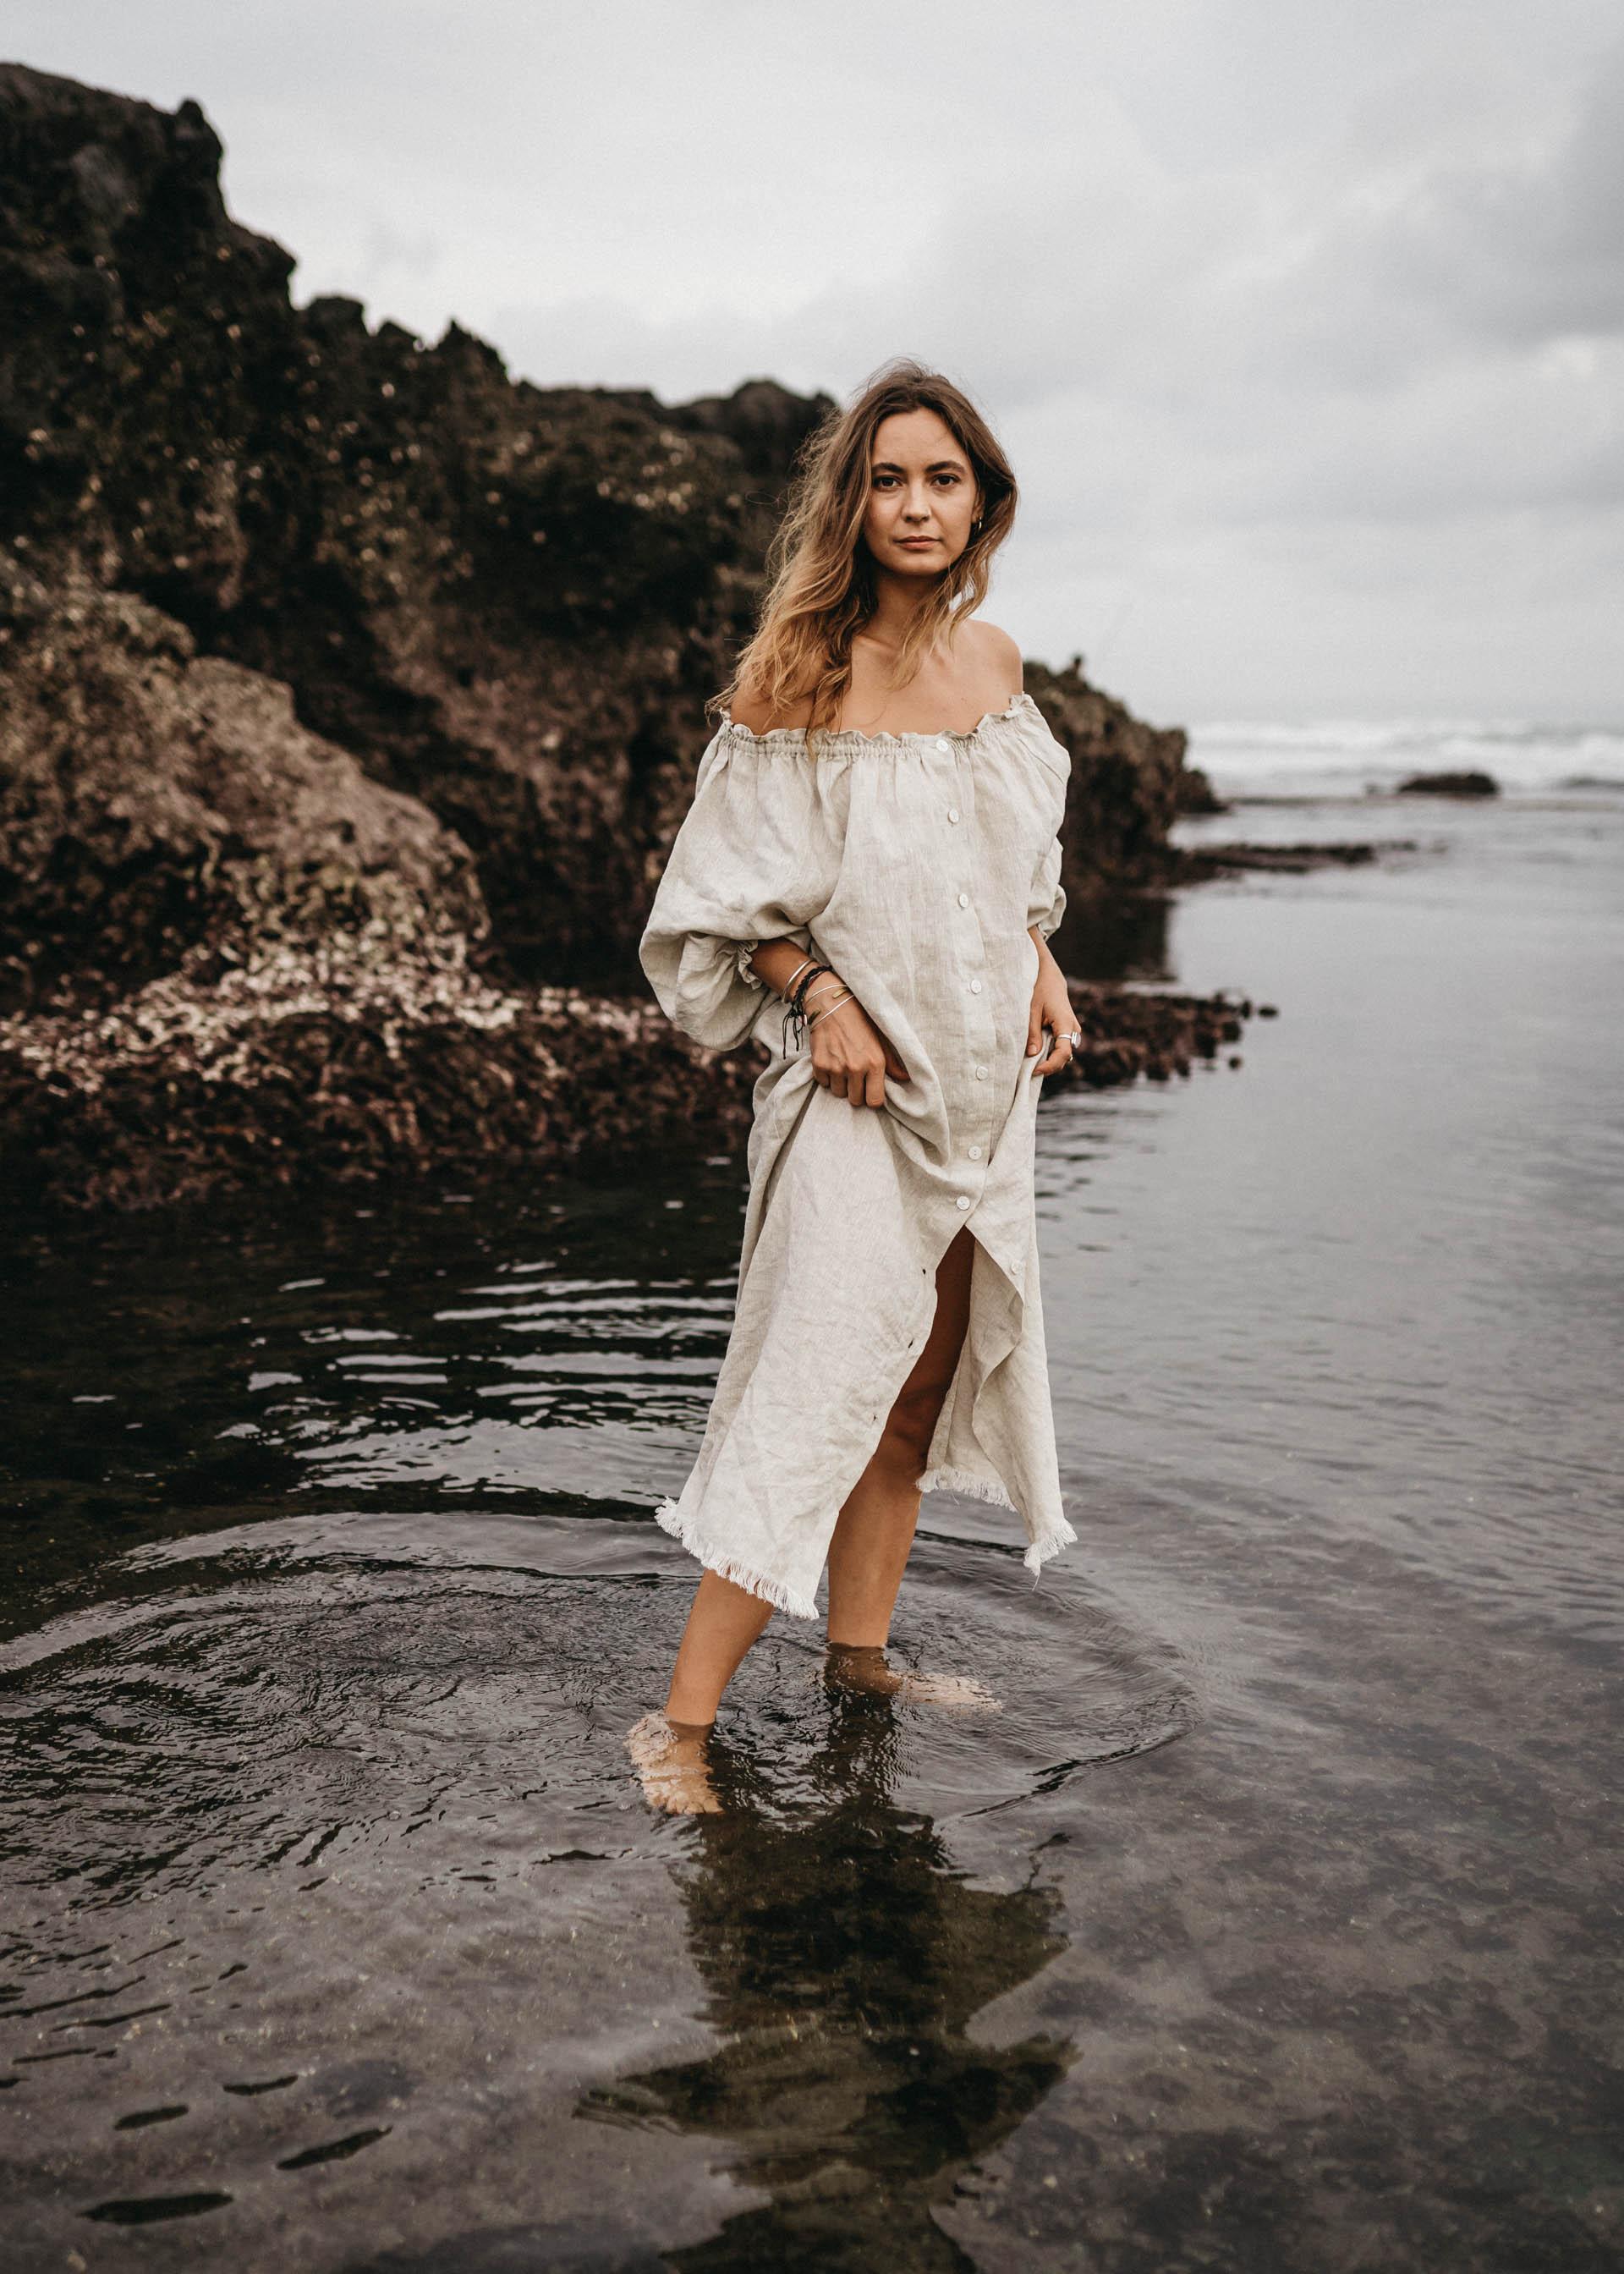 keira-mason-studio-karma-beach-natural-dress-linen-beach-shot.jpg